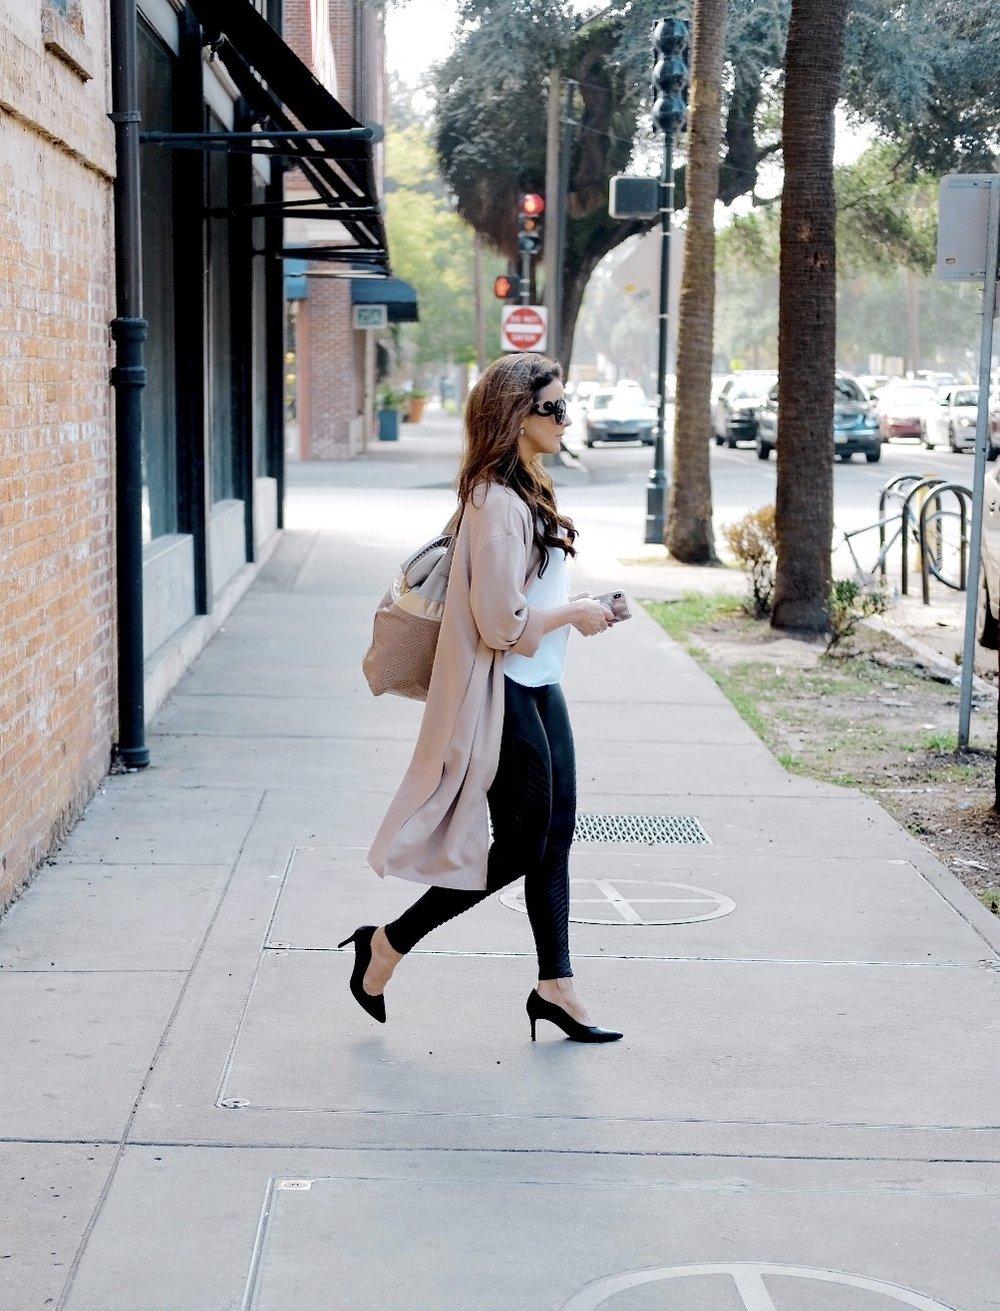 Brenna Lauren Michaels on shopping trip on Broughton Street, Savannah GA